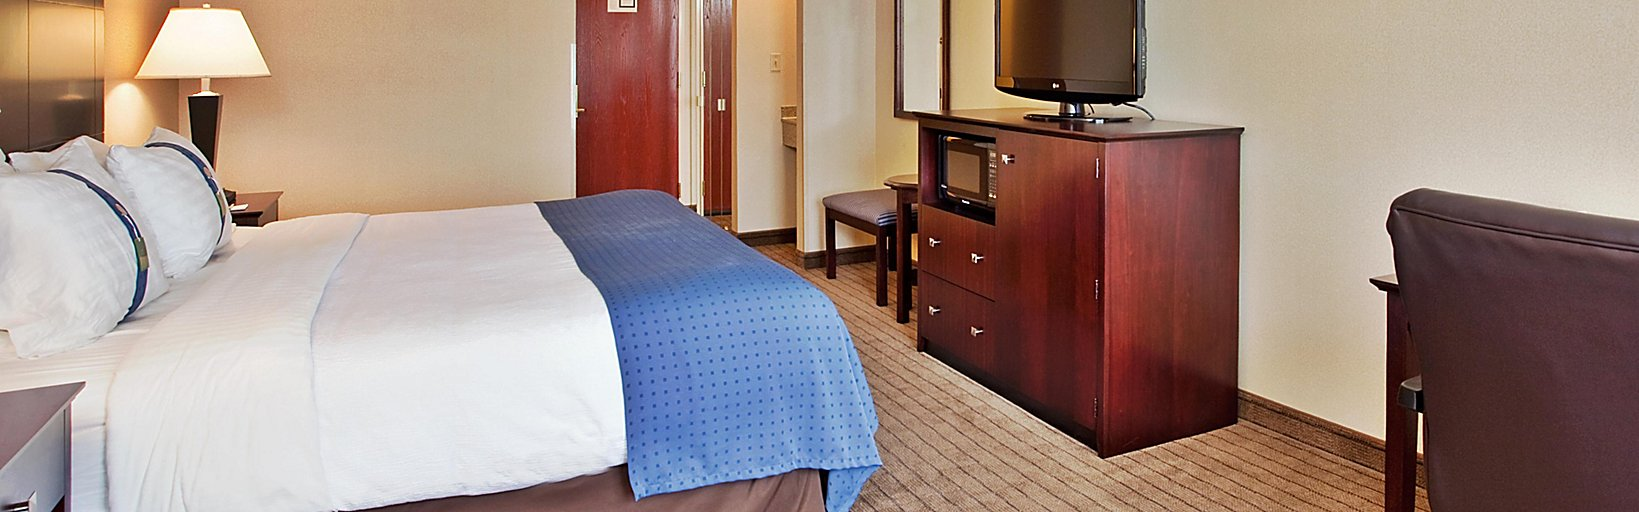 Holiday Inn Overland Park Hotels